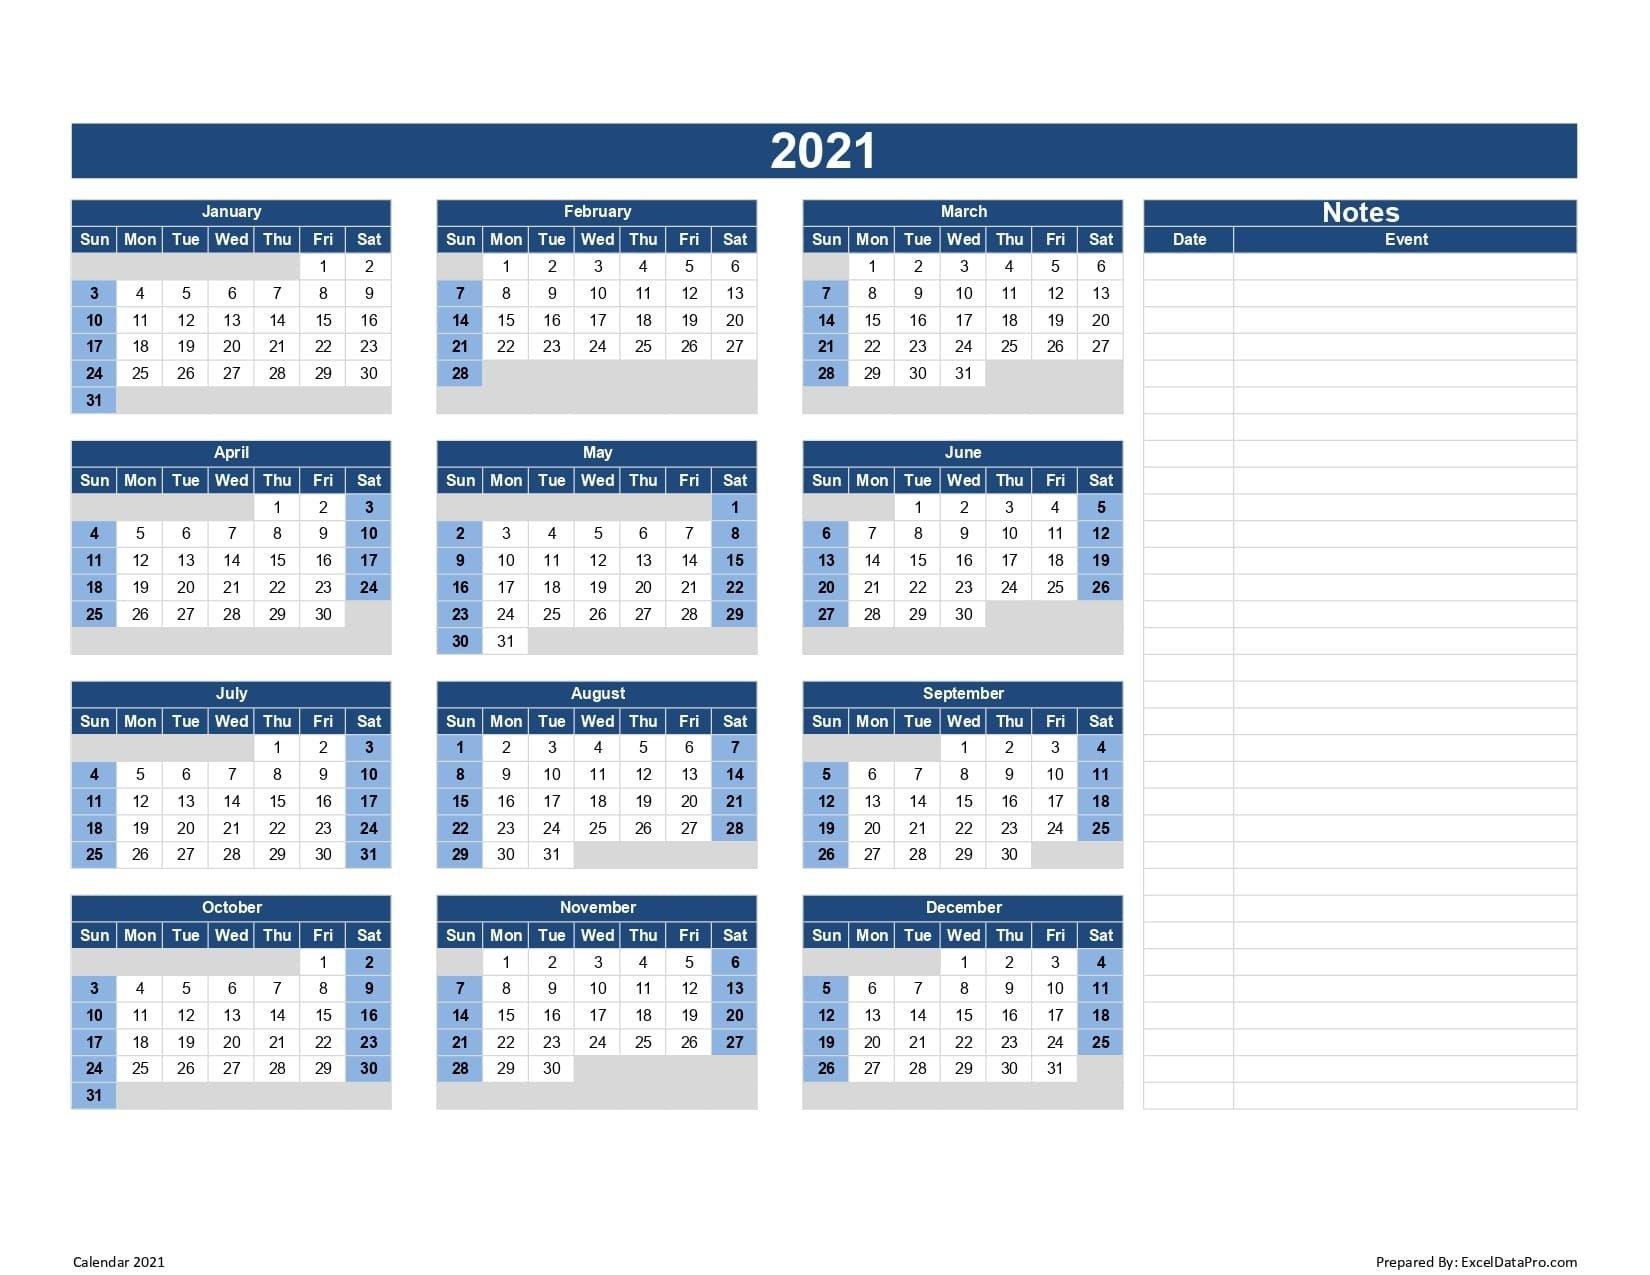 Calendar 2021 Excel Templates, Printable Pdfs & Images - Exceldatapro intended for Calendar Template 2021 Indesign